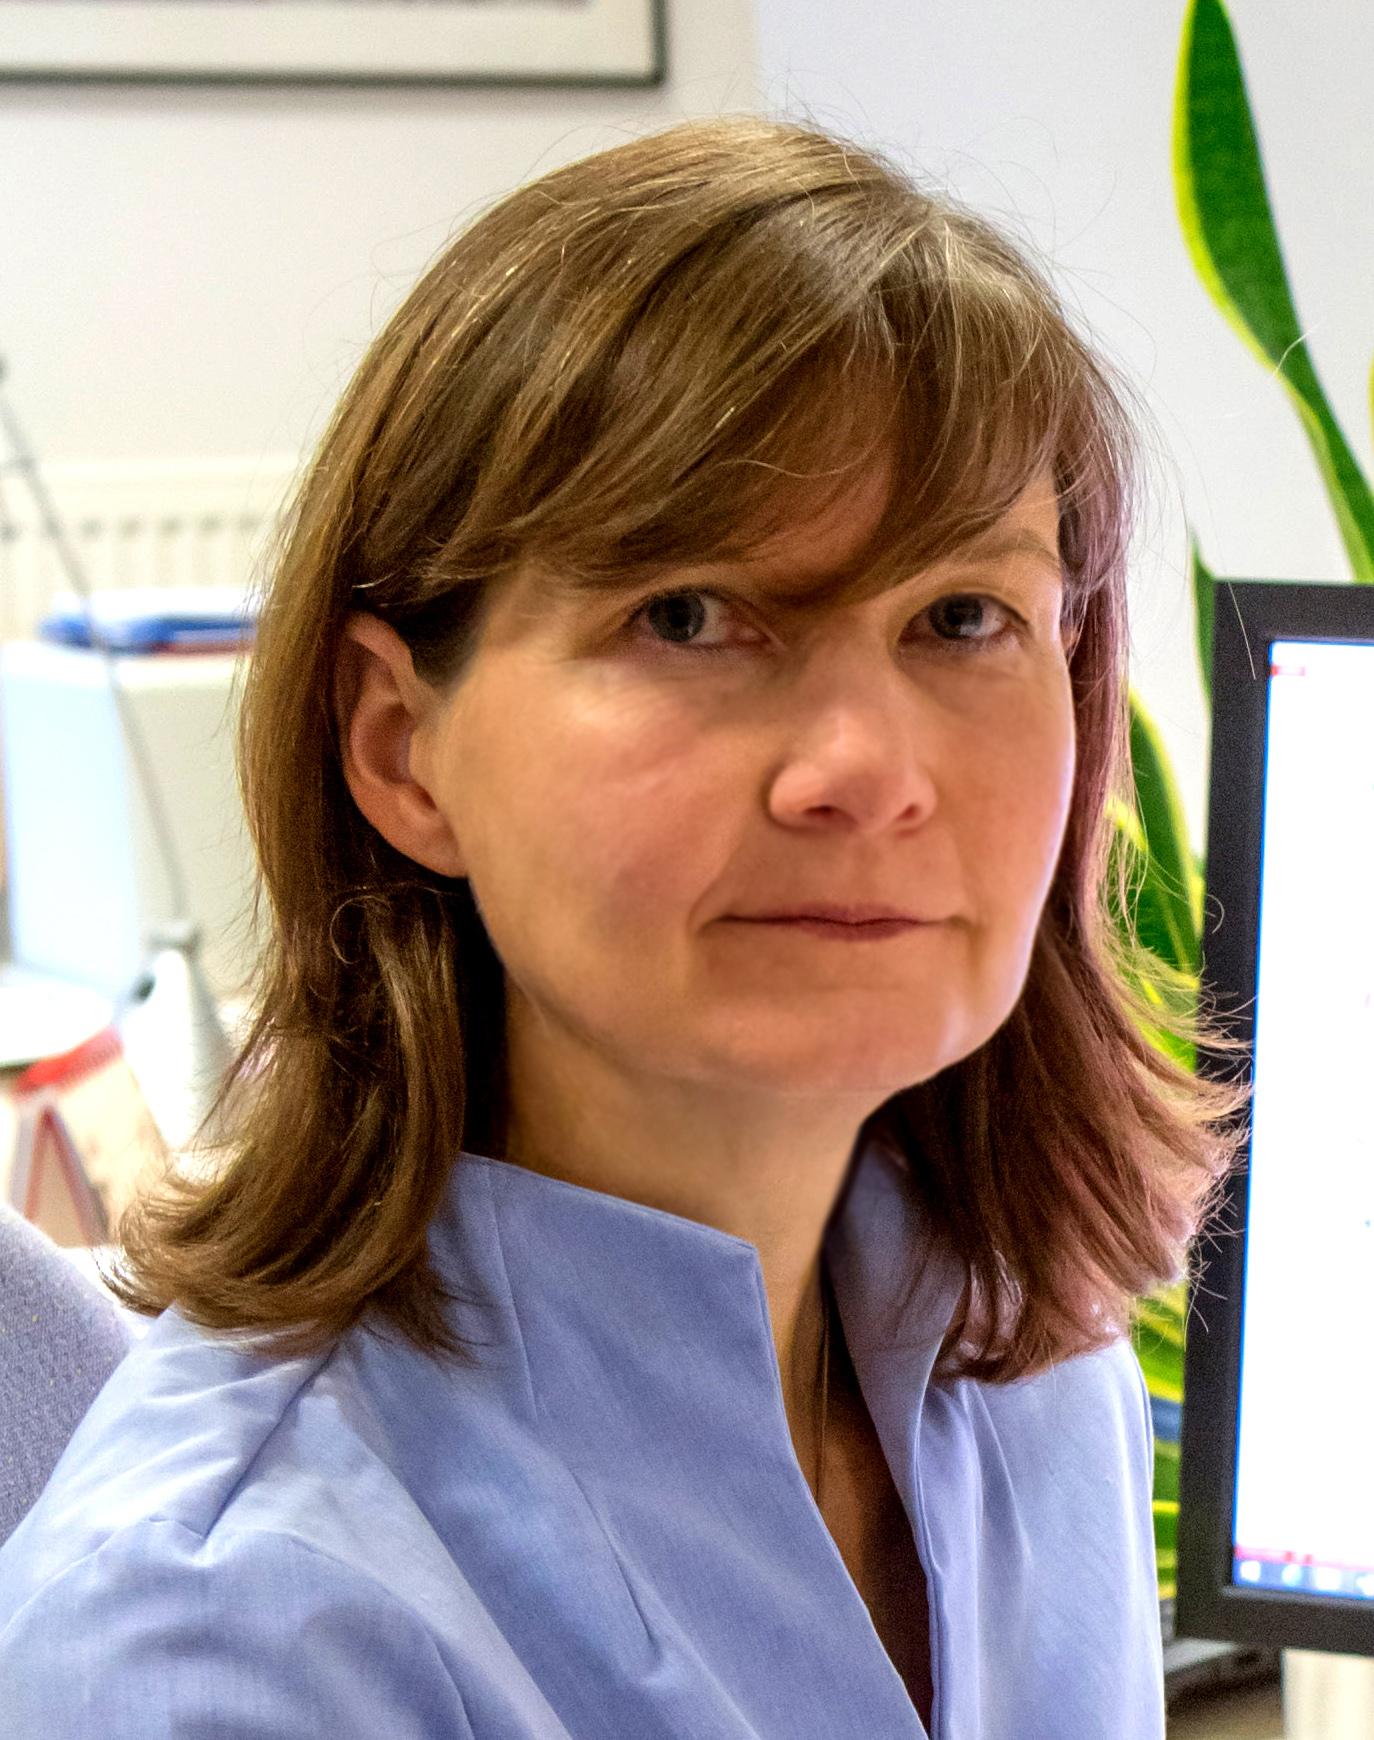 Claudia Krug